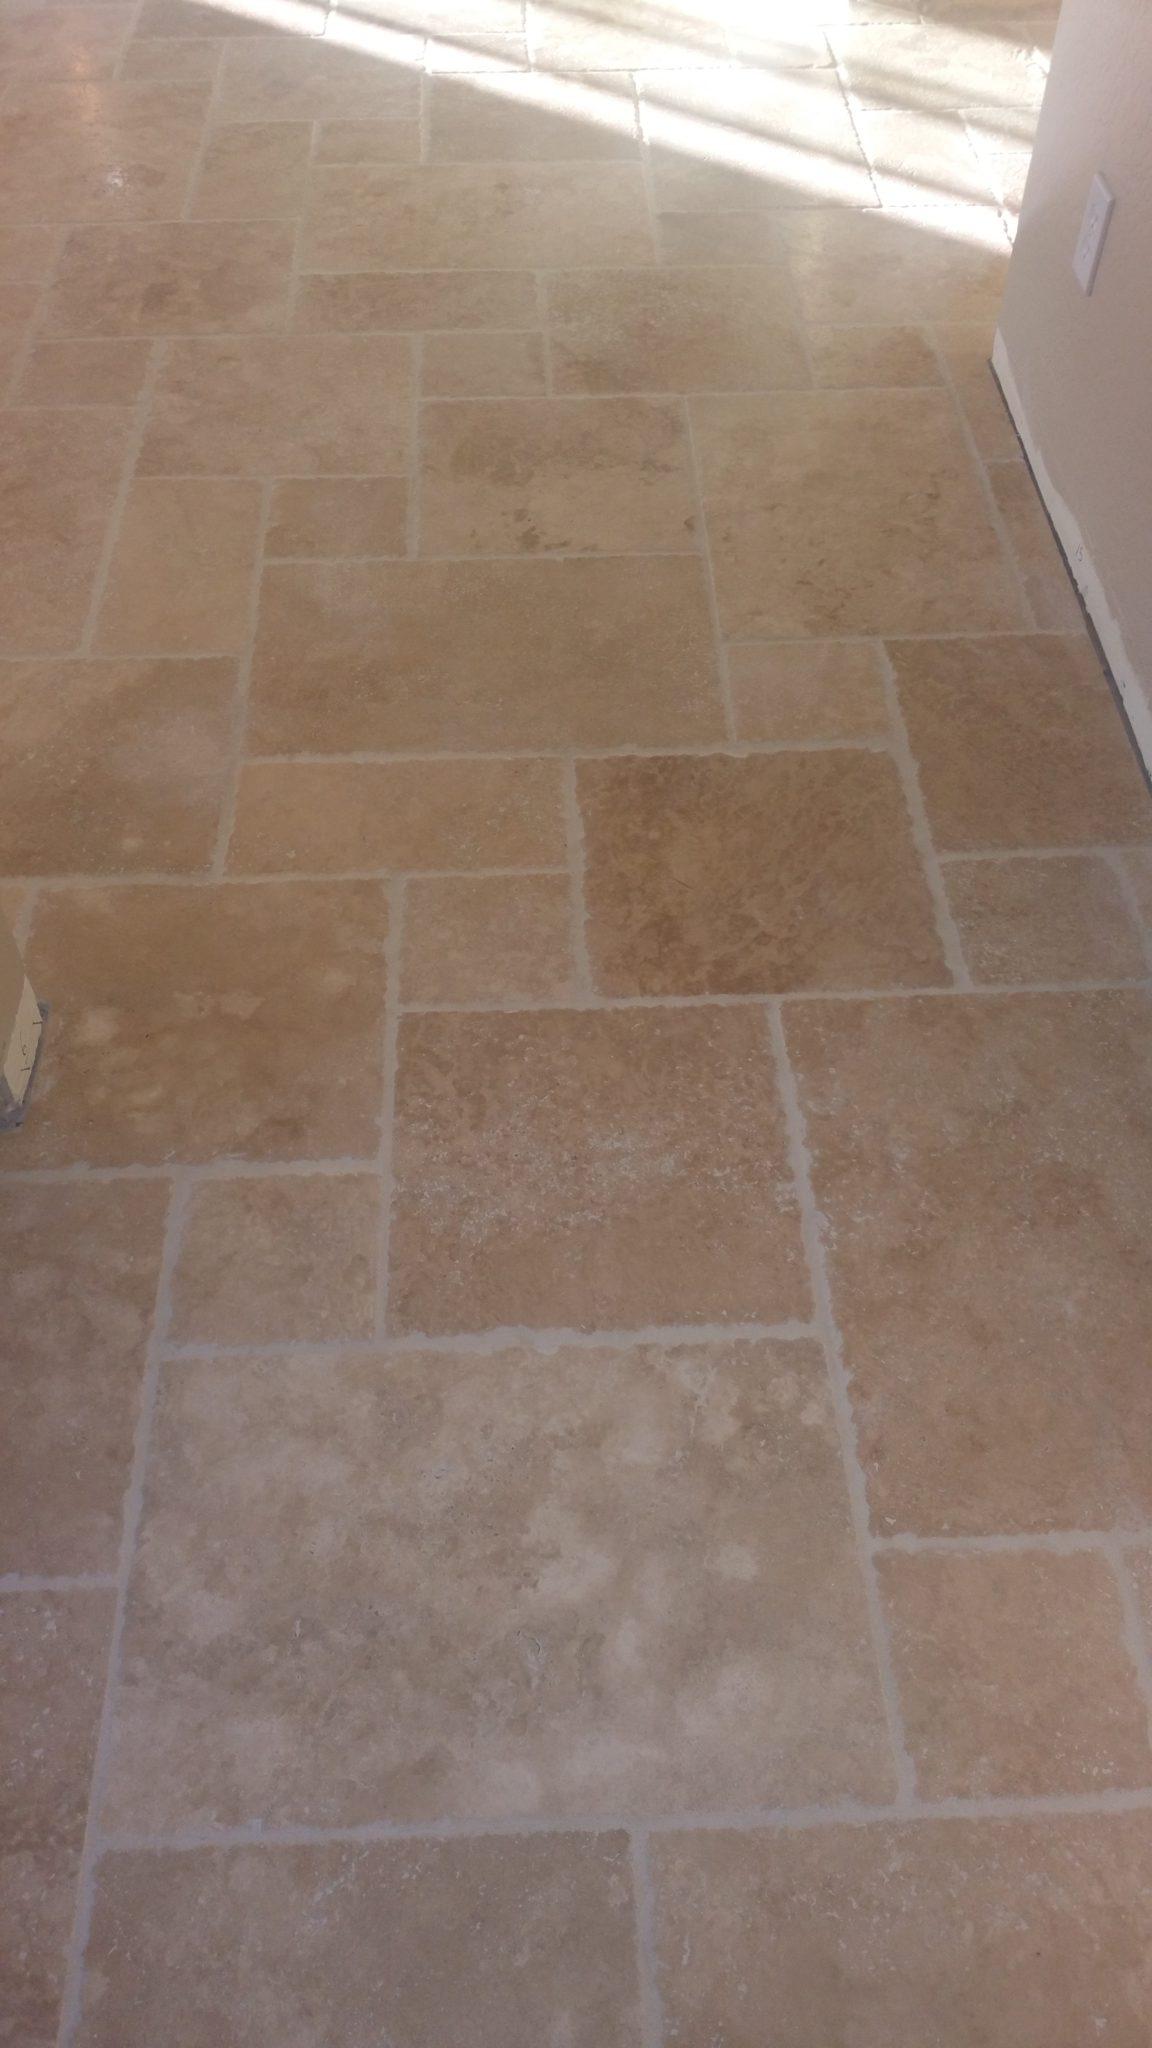 Travertine Marble Tile : Ivory beige travertine tile qdi surfaces